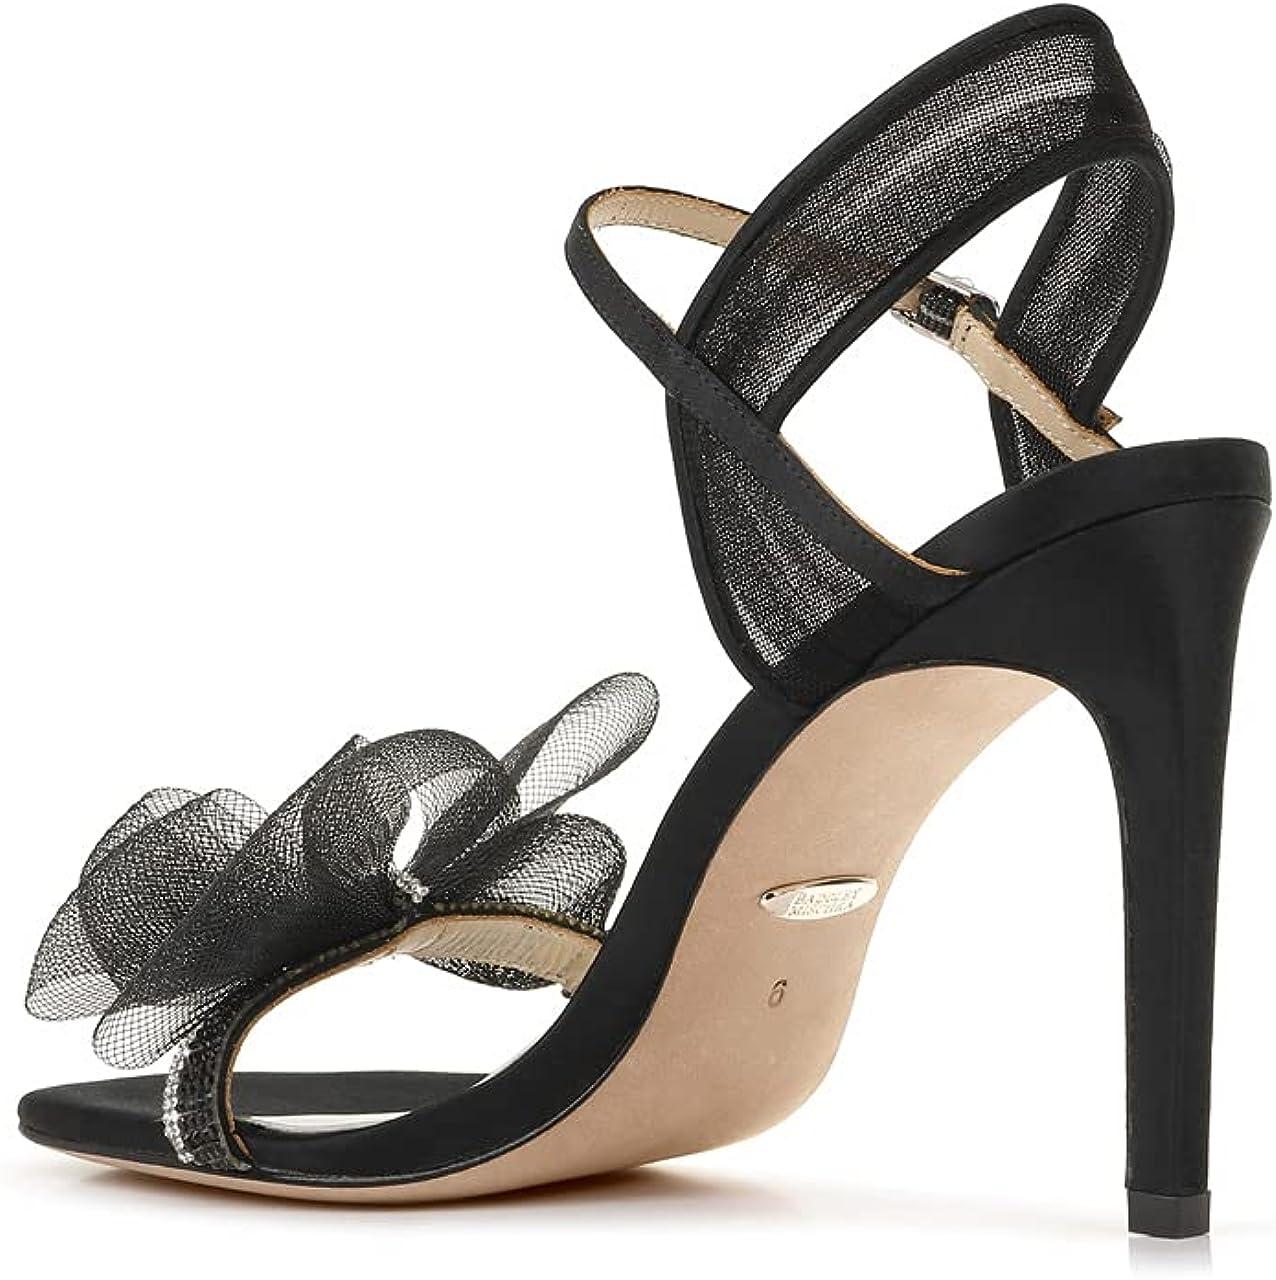 Badgley Mischka Women's Jessica Heeled Sandal